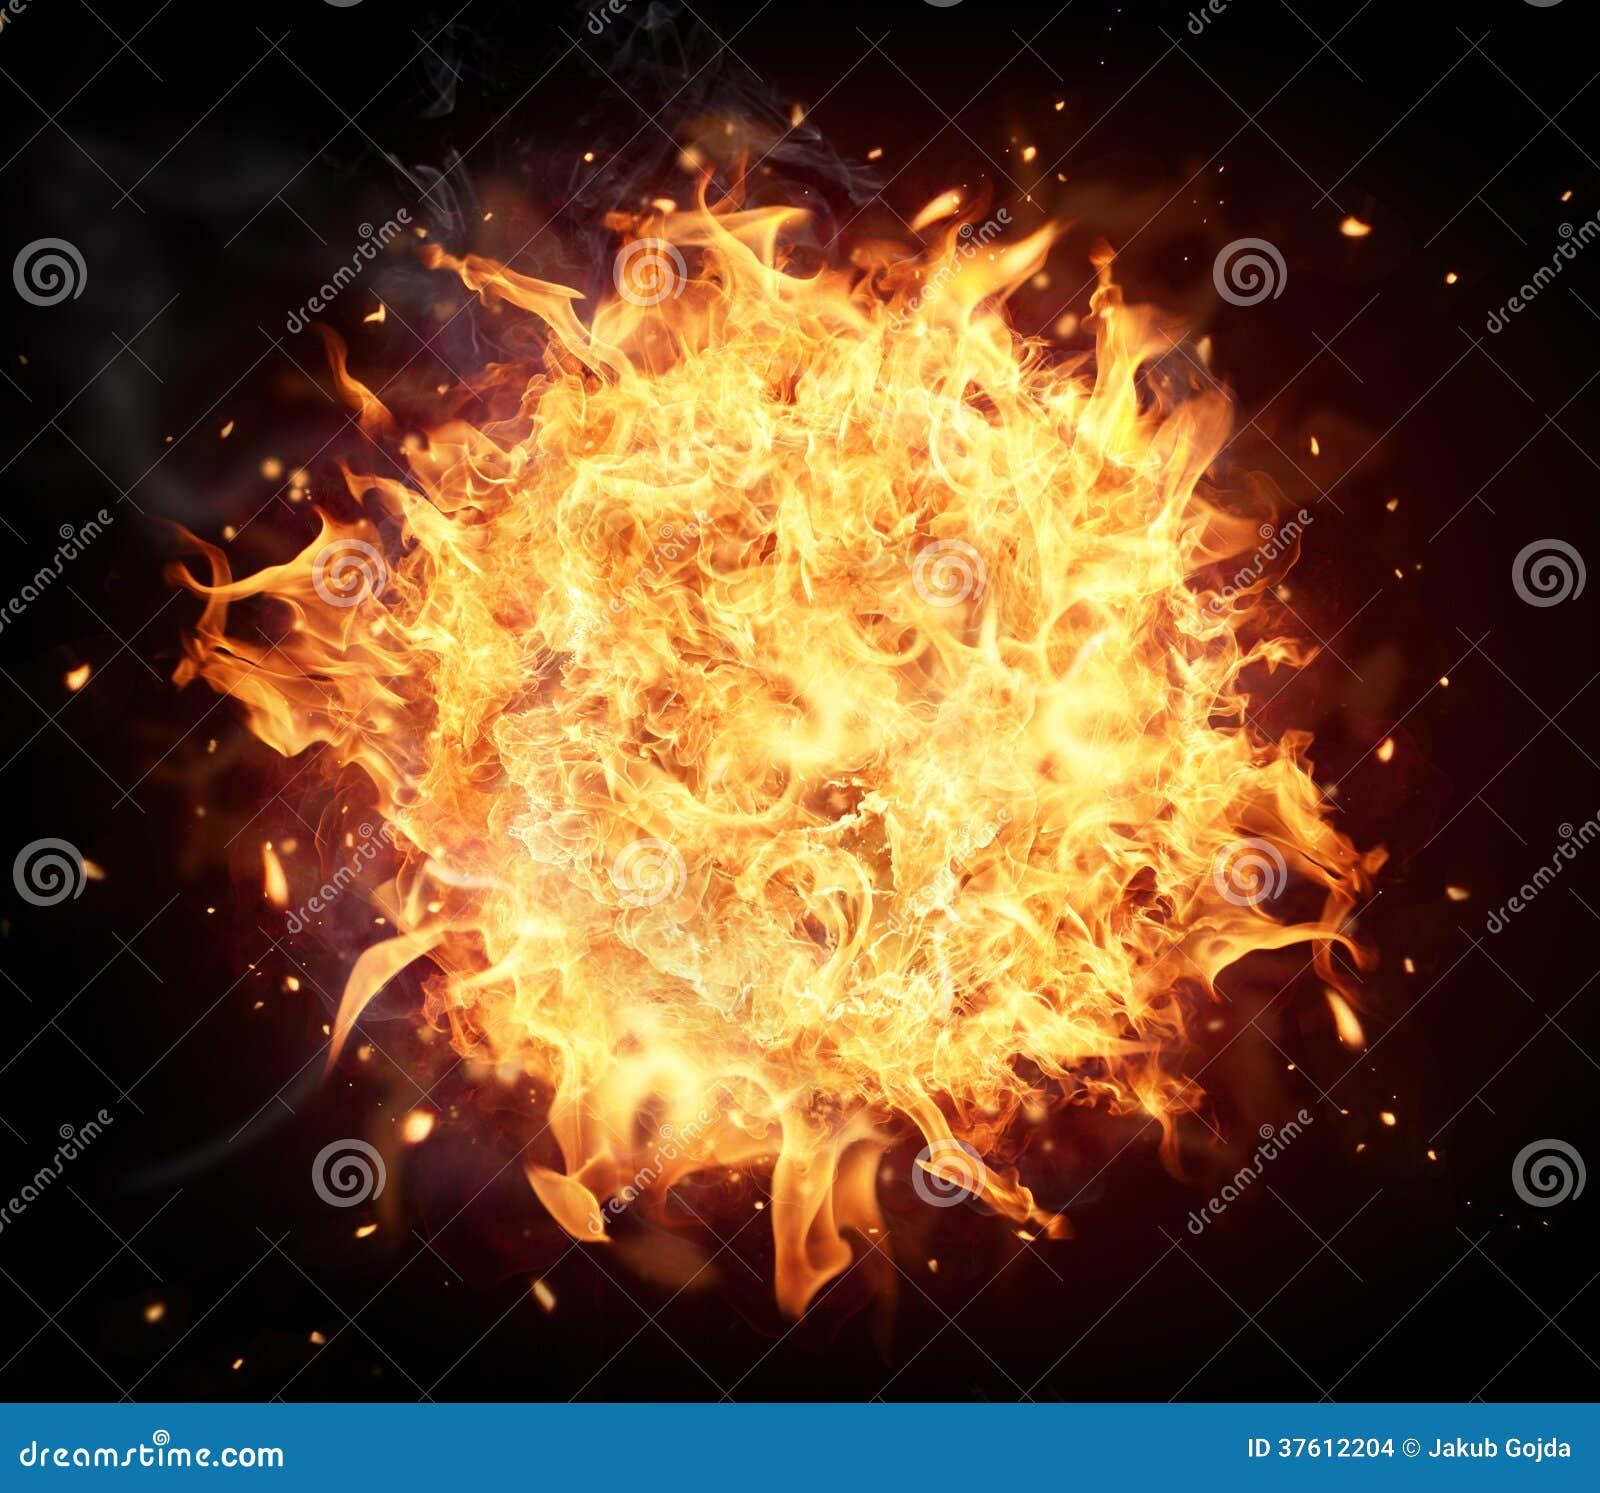 boule de feu wallpaper - photo #1